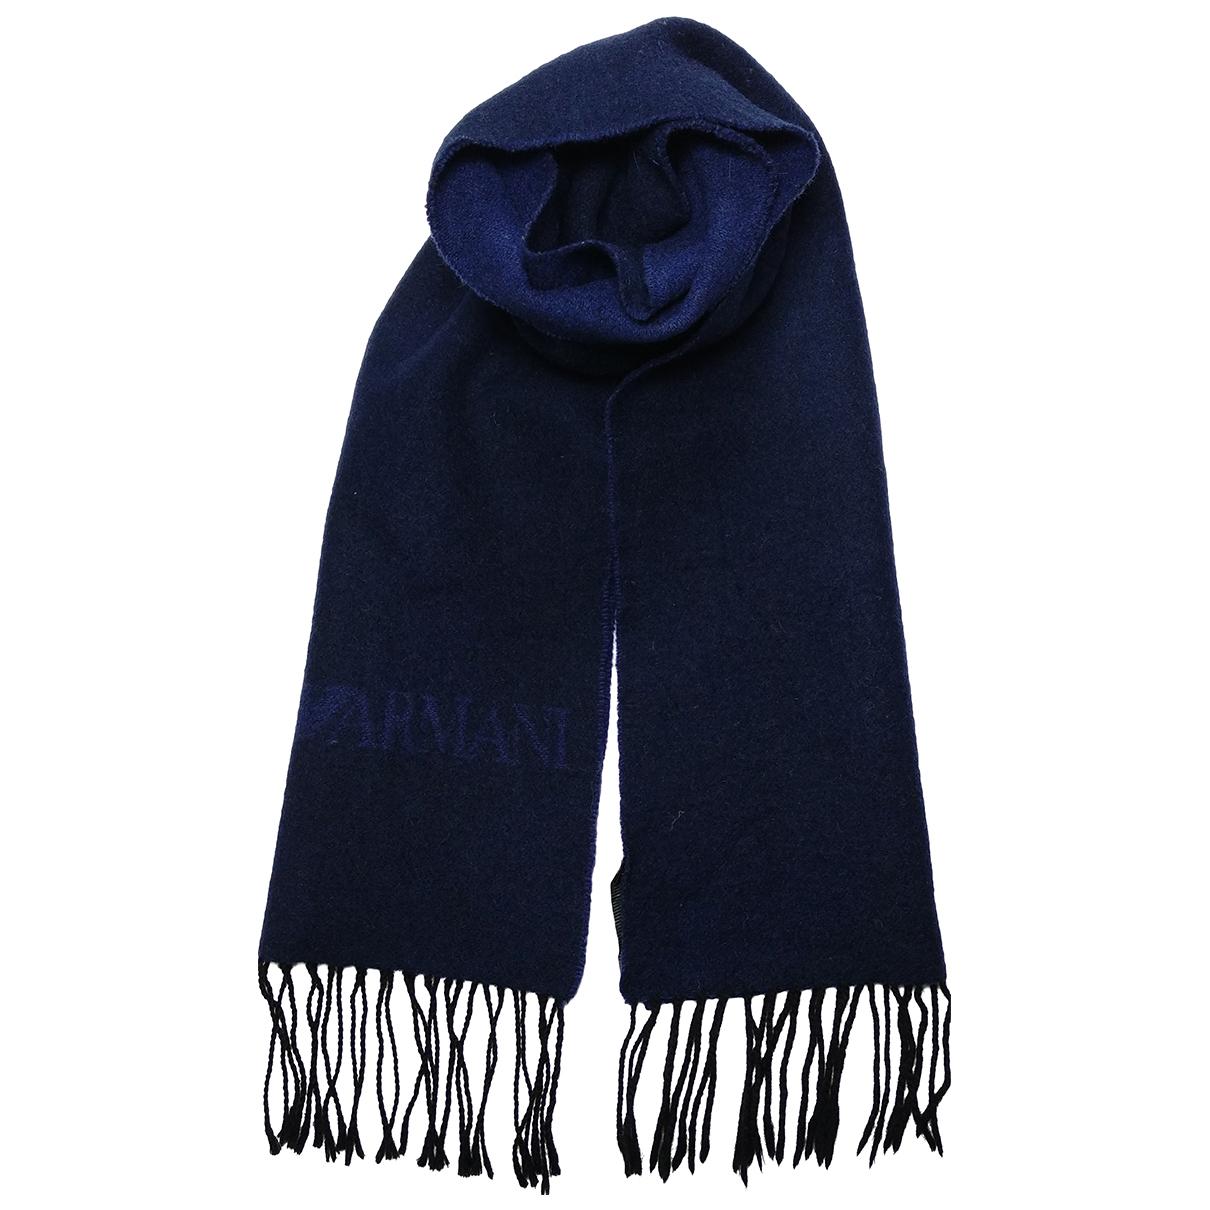 Emporio Armani \N Schal in  Blau Wolle